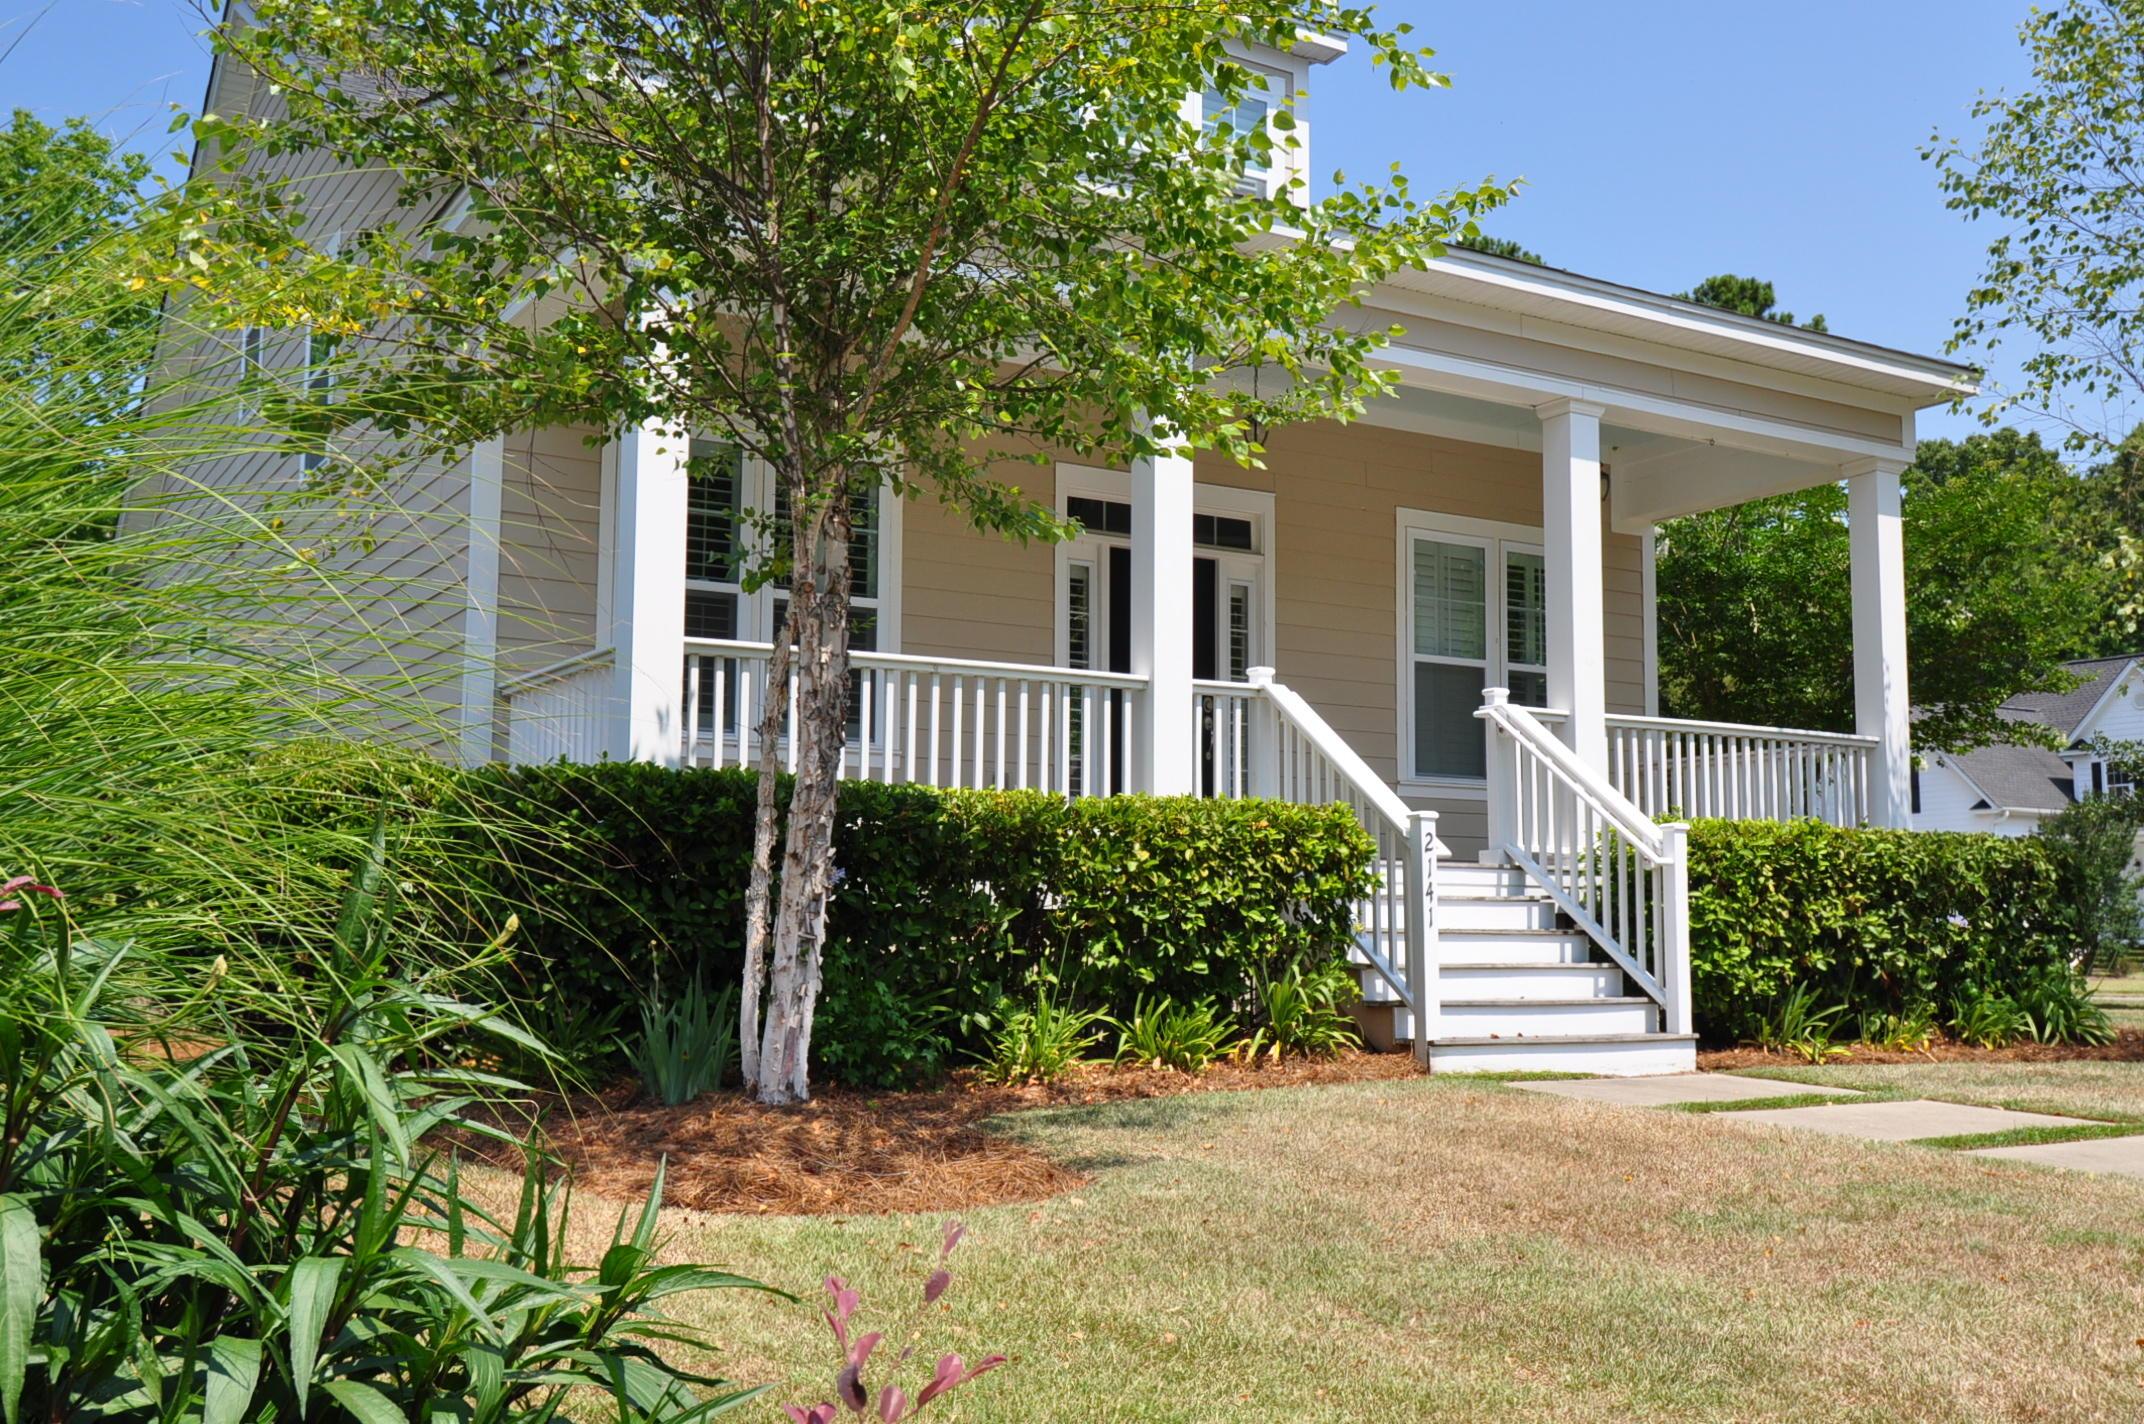 Battery Gaillard Homes For Sale - 2141 Military, Charleston, SC - 13